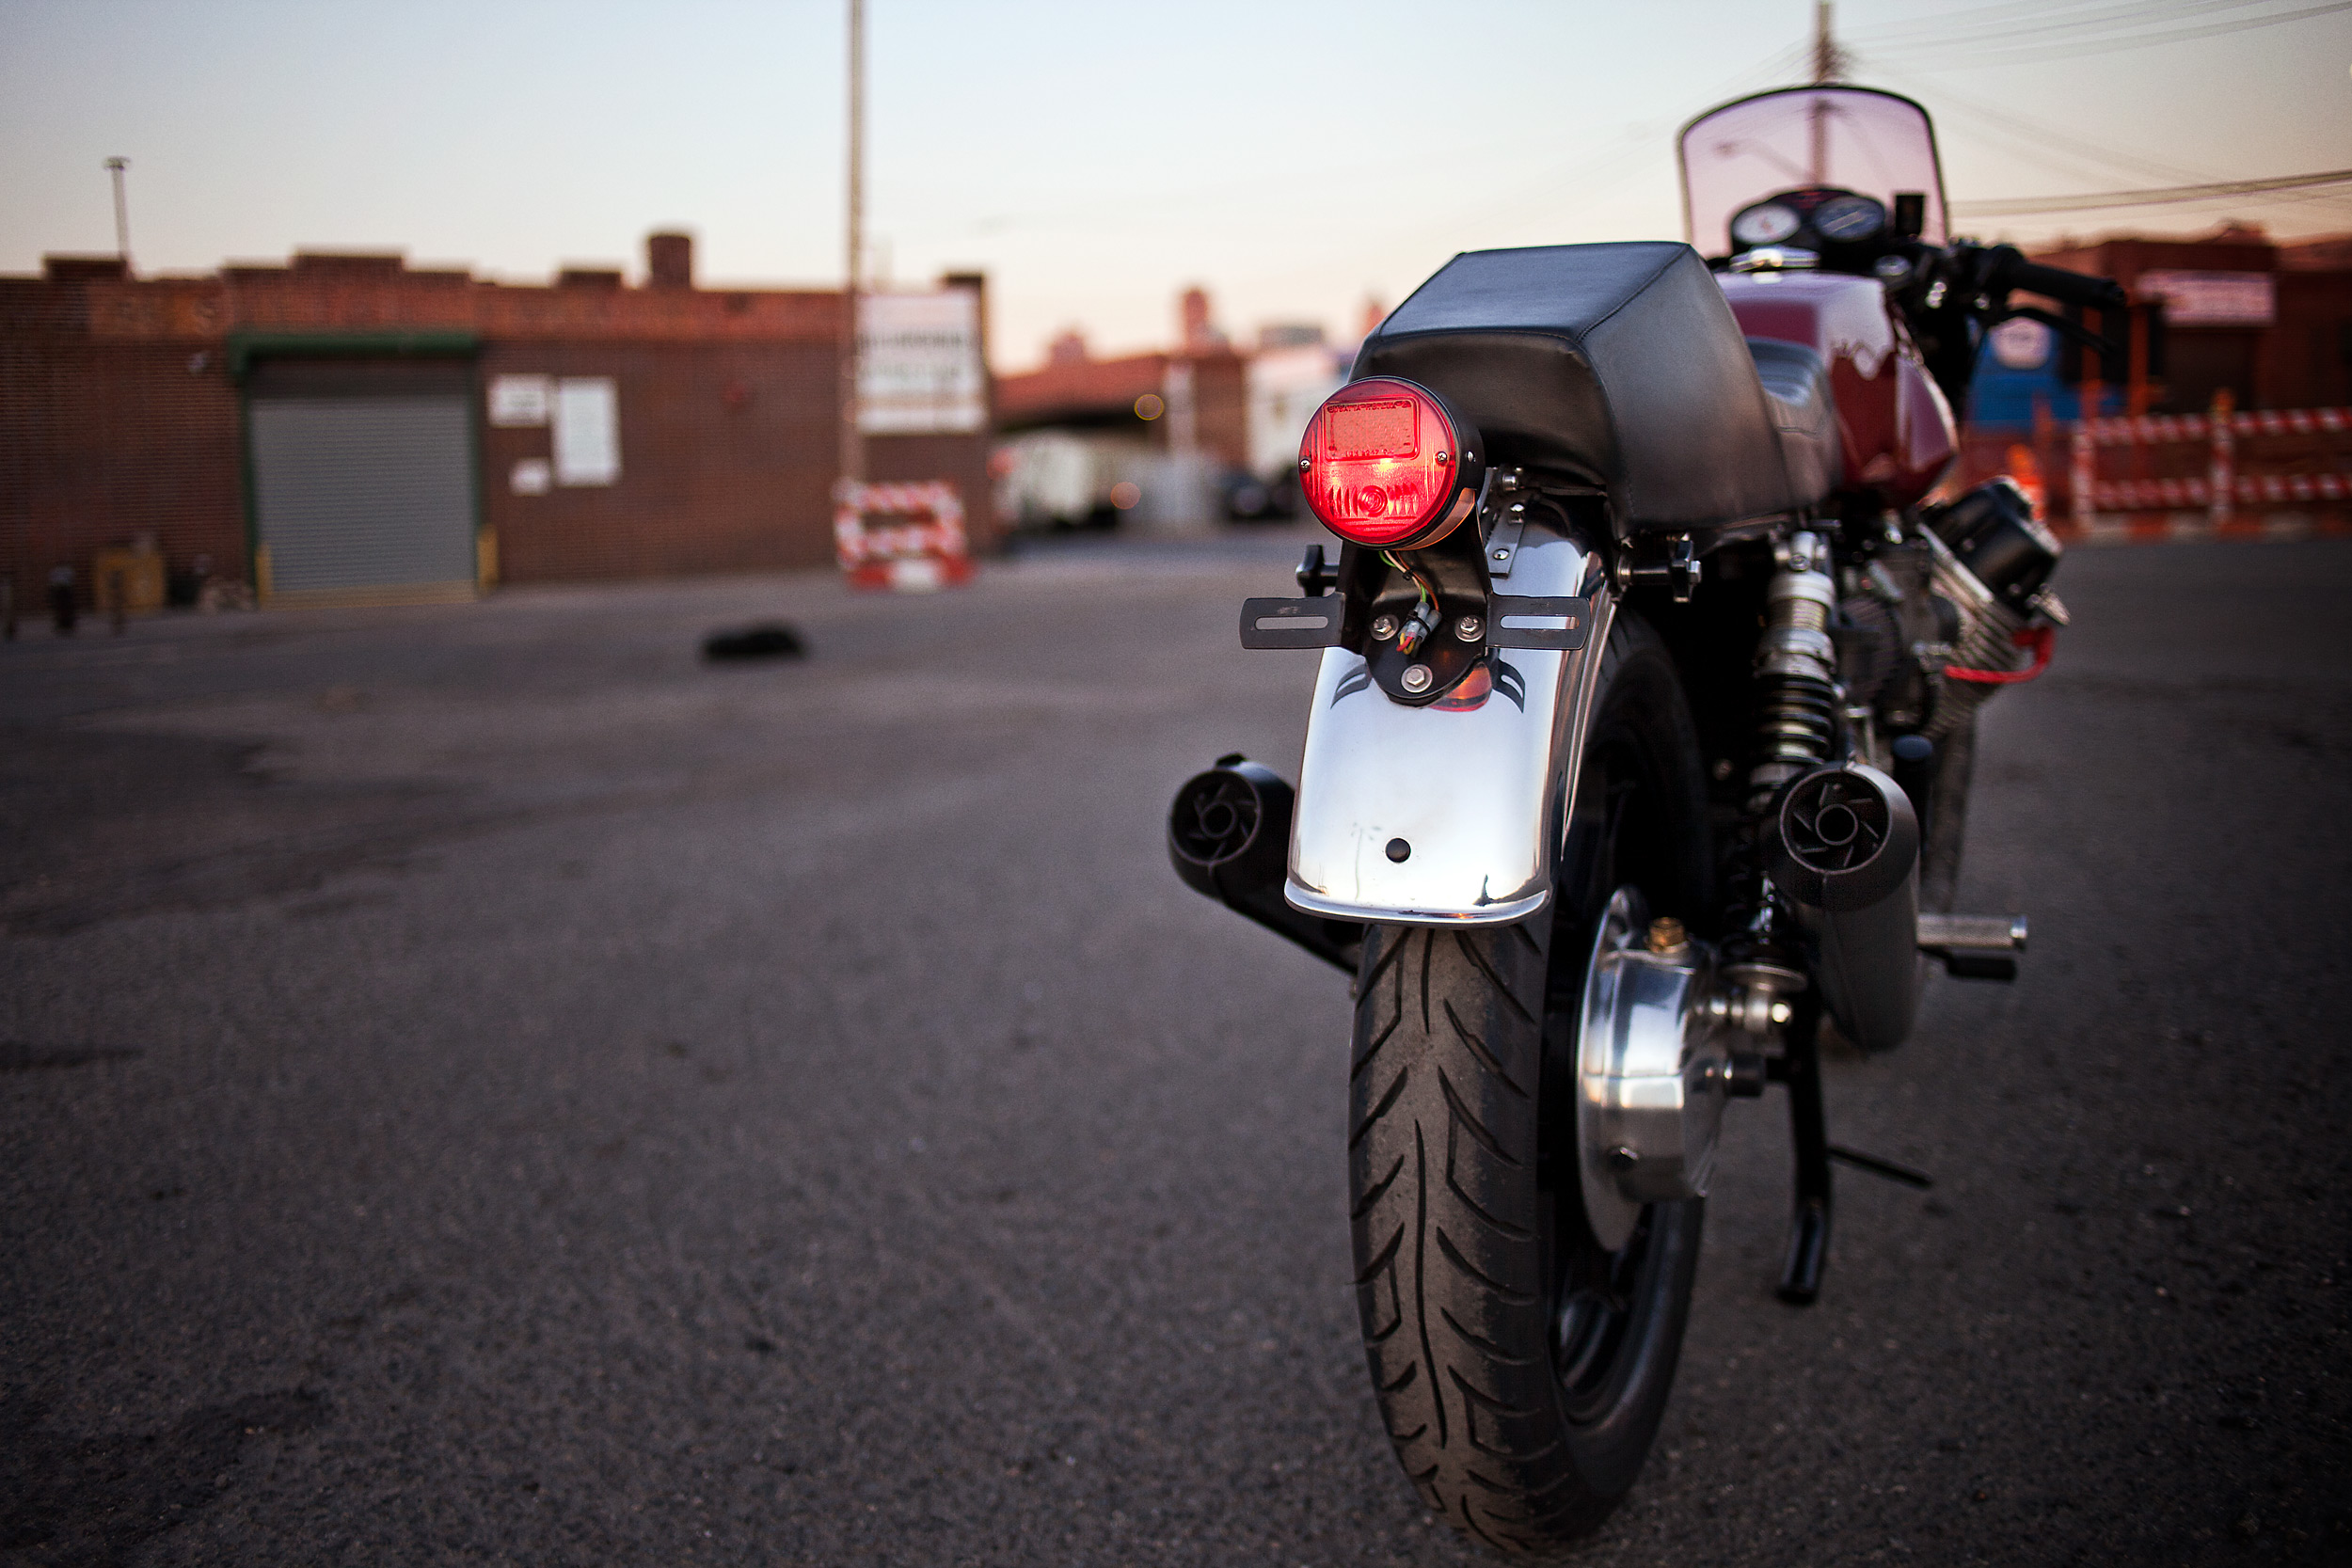 1977 Moto Guzzi lemans 1 custom lafranconi exhaust